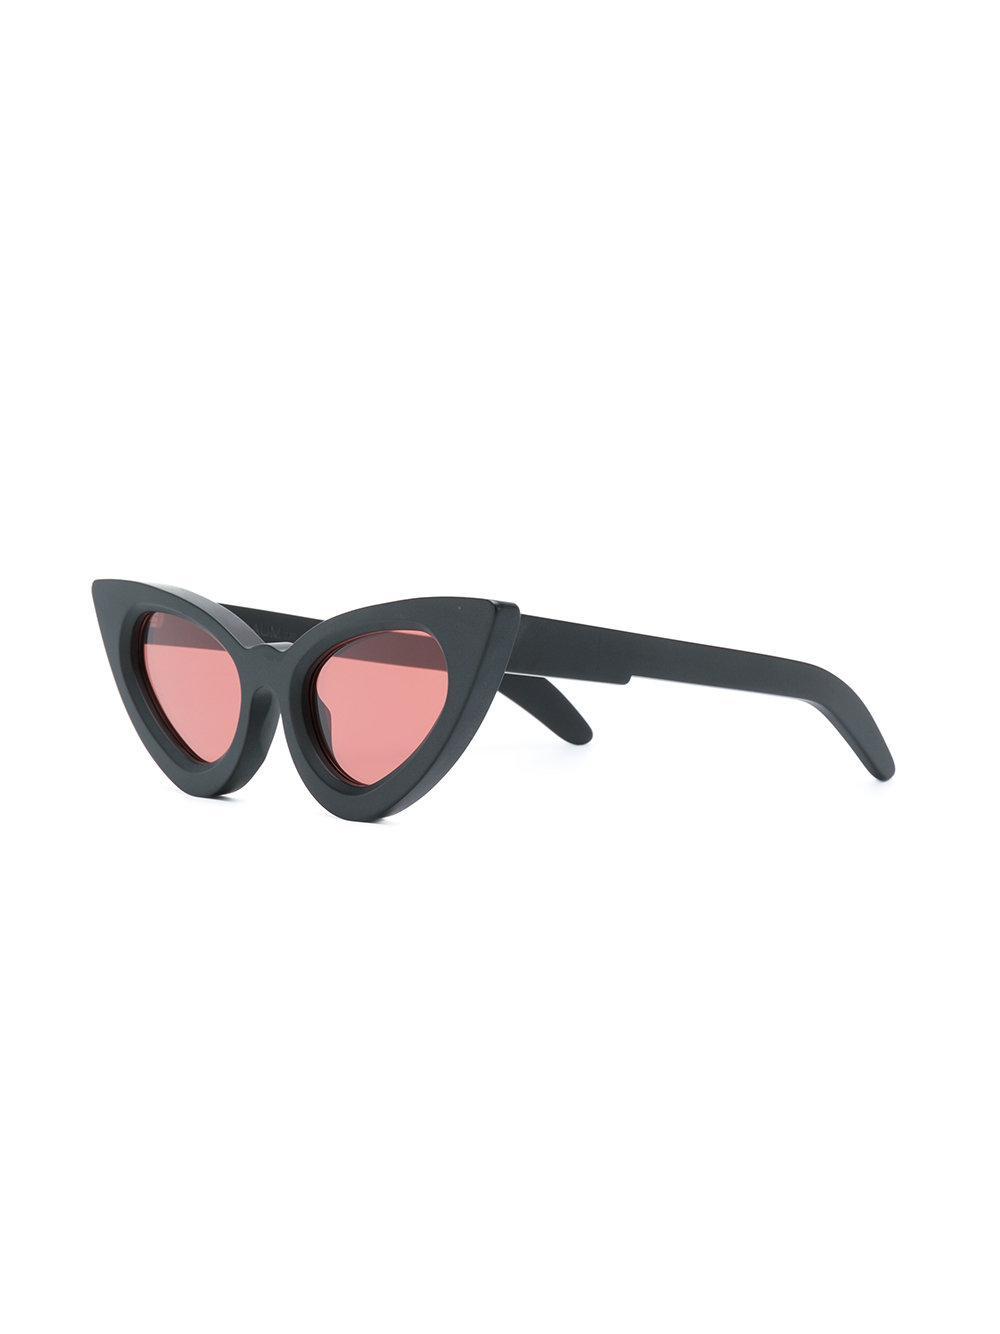 Maskey cat eye sunglasses - Black Kuboraum jxlOS5